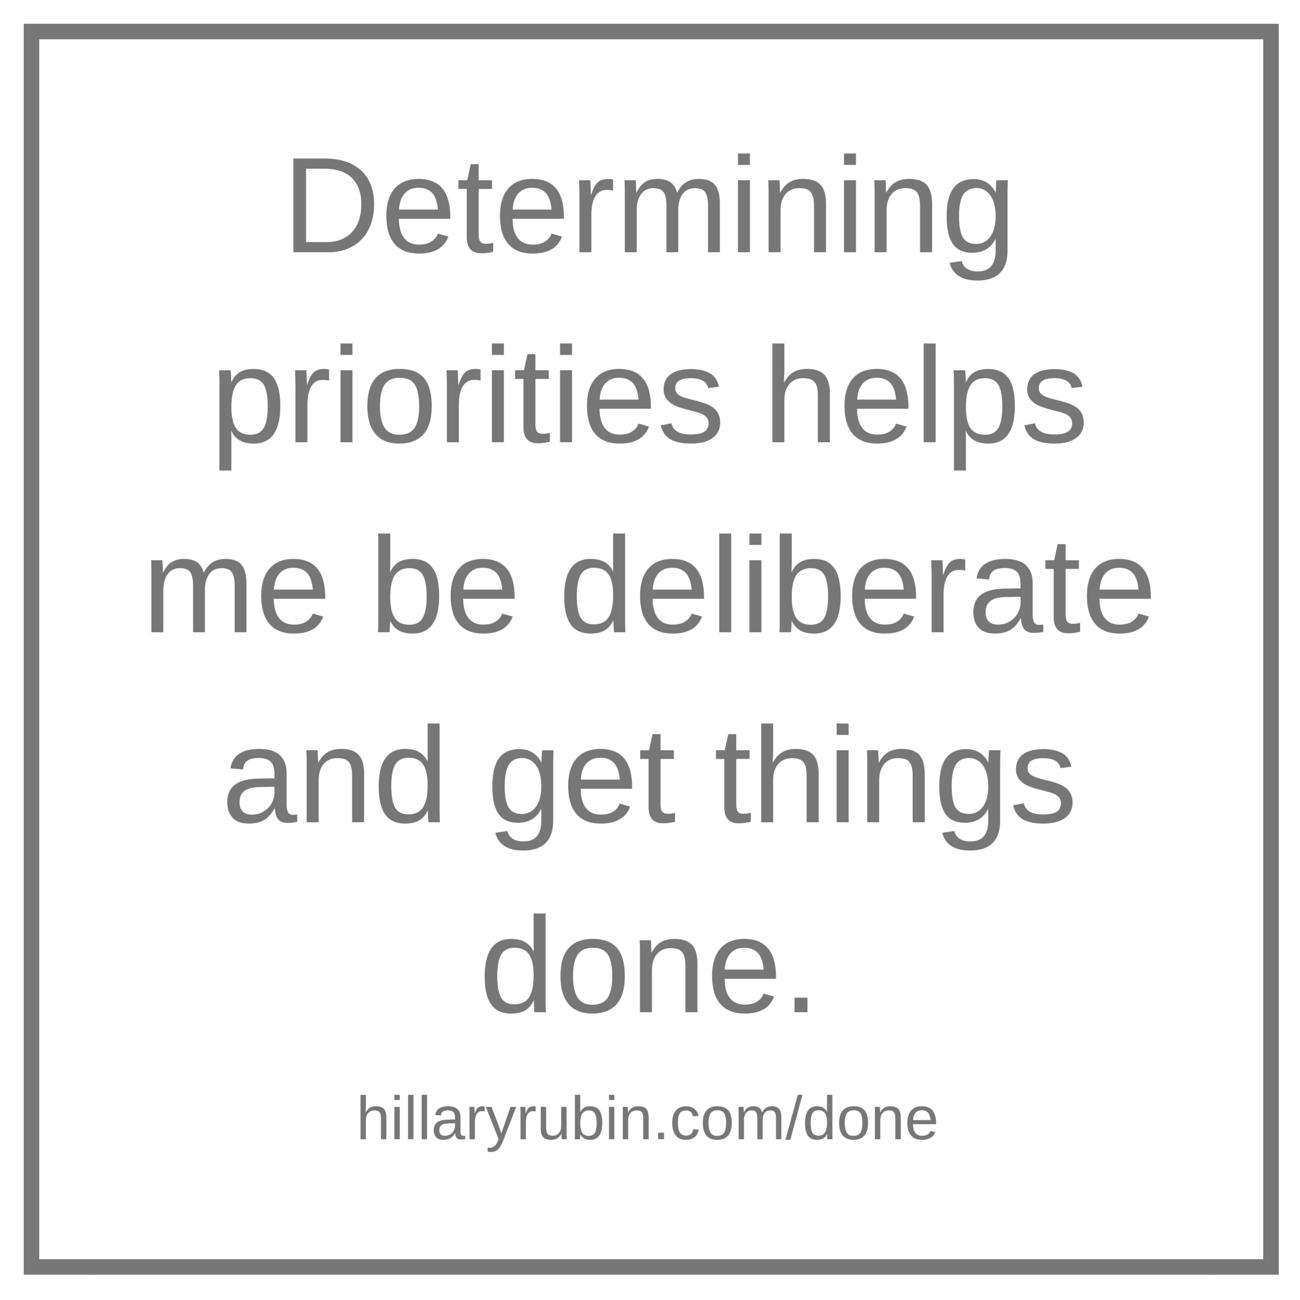 Hillary Rubin - get things done